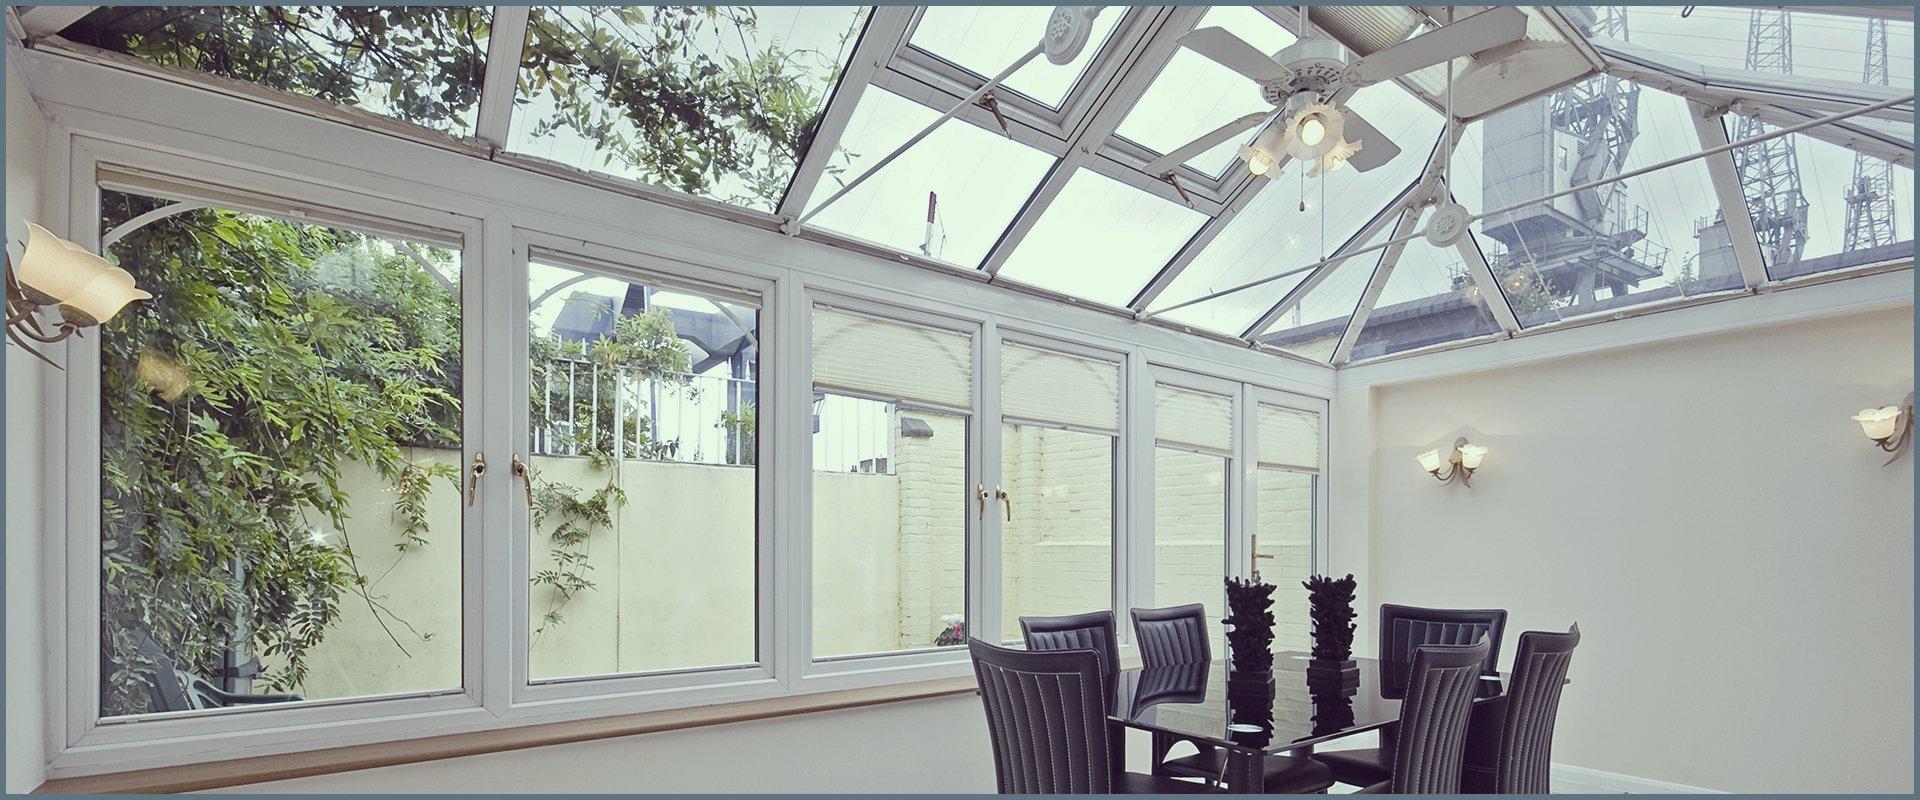 well plastered interiors